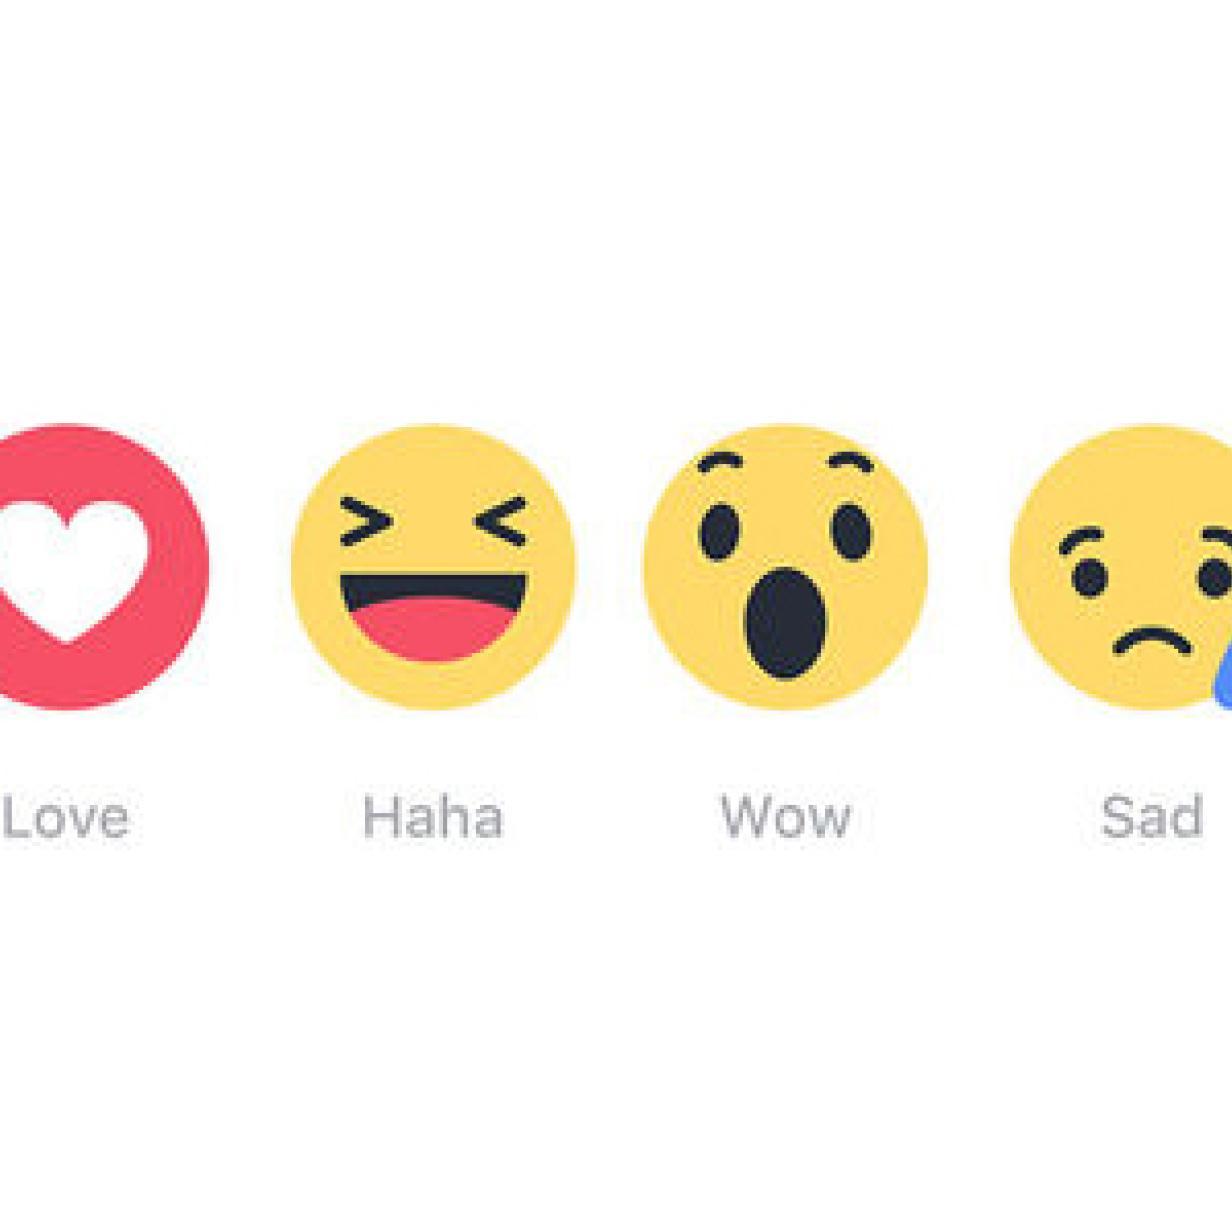 Facebook bringt Emojis als Like-Alternative | futurezone at